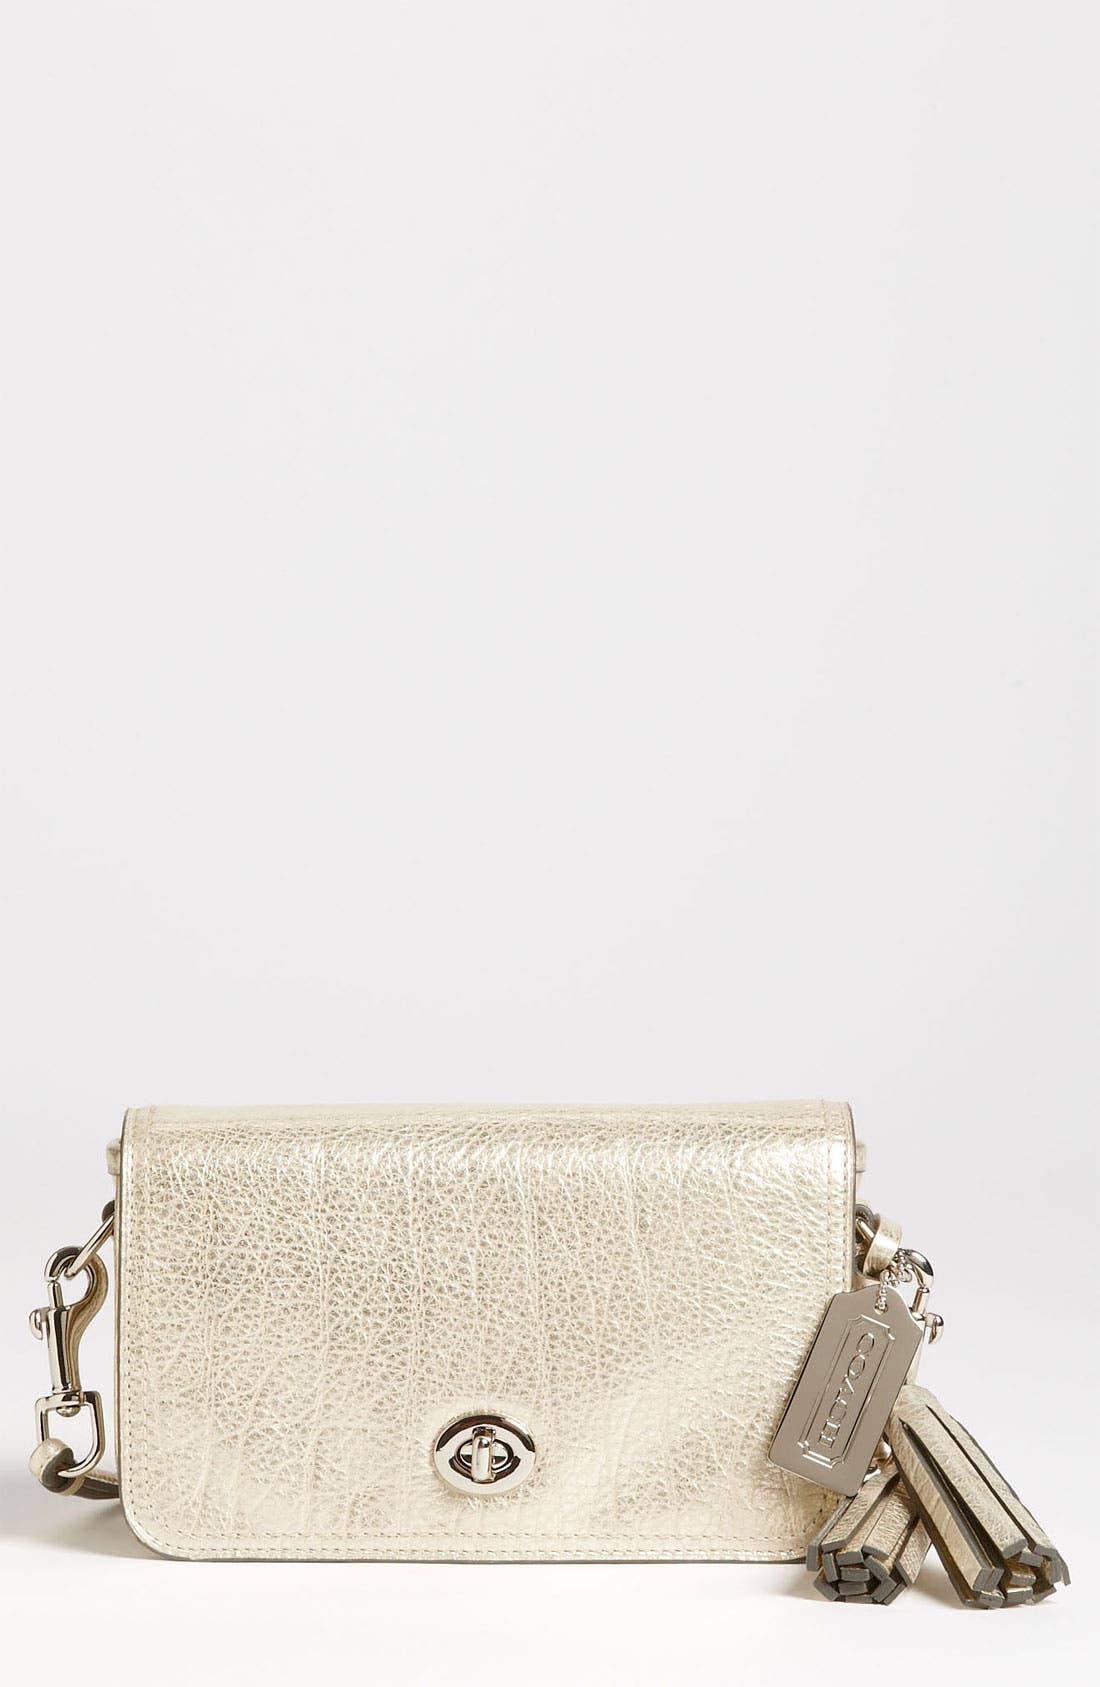 Main Image - COACH 'Legacy - Penny' Metallic Leather Crossbody Bag